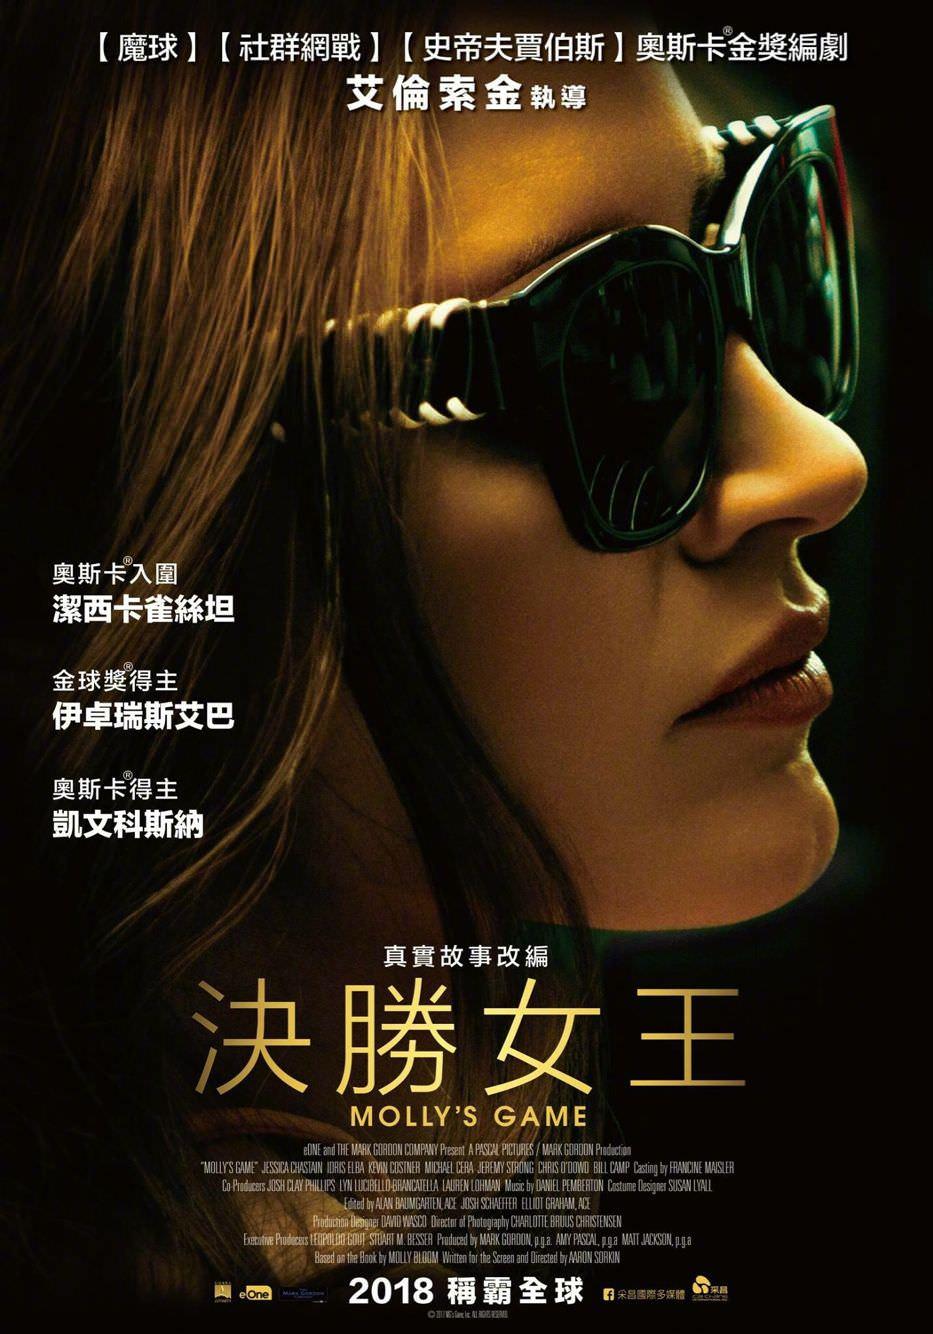 Movie, Molly's Game(美國, 2017) / 決勝女王(台灣) / 莫莉遊戲(香港) / 茉莉牌局(網路), 電影海報, 台灣